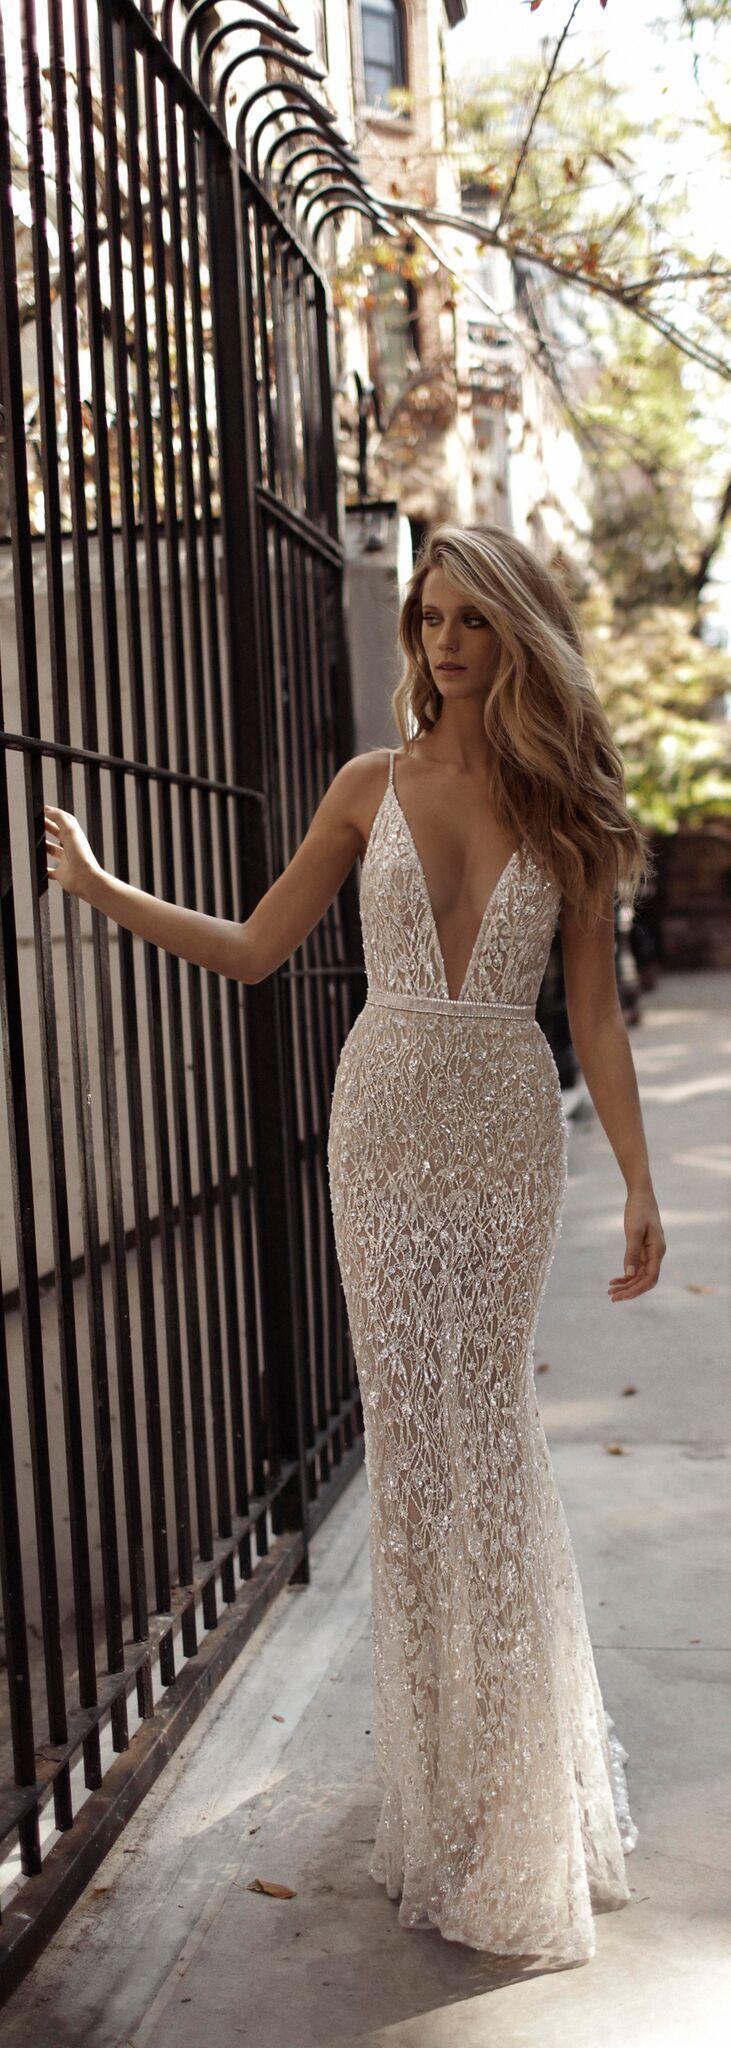 Best 25+ Evening dresses ideas on Pinterest | Beautiful ...